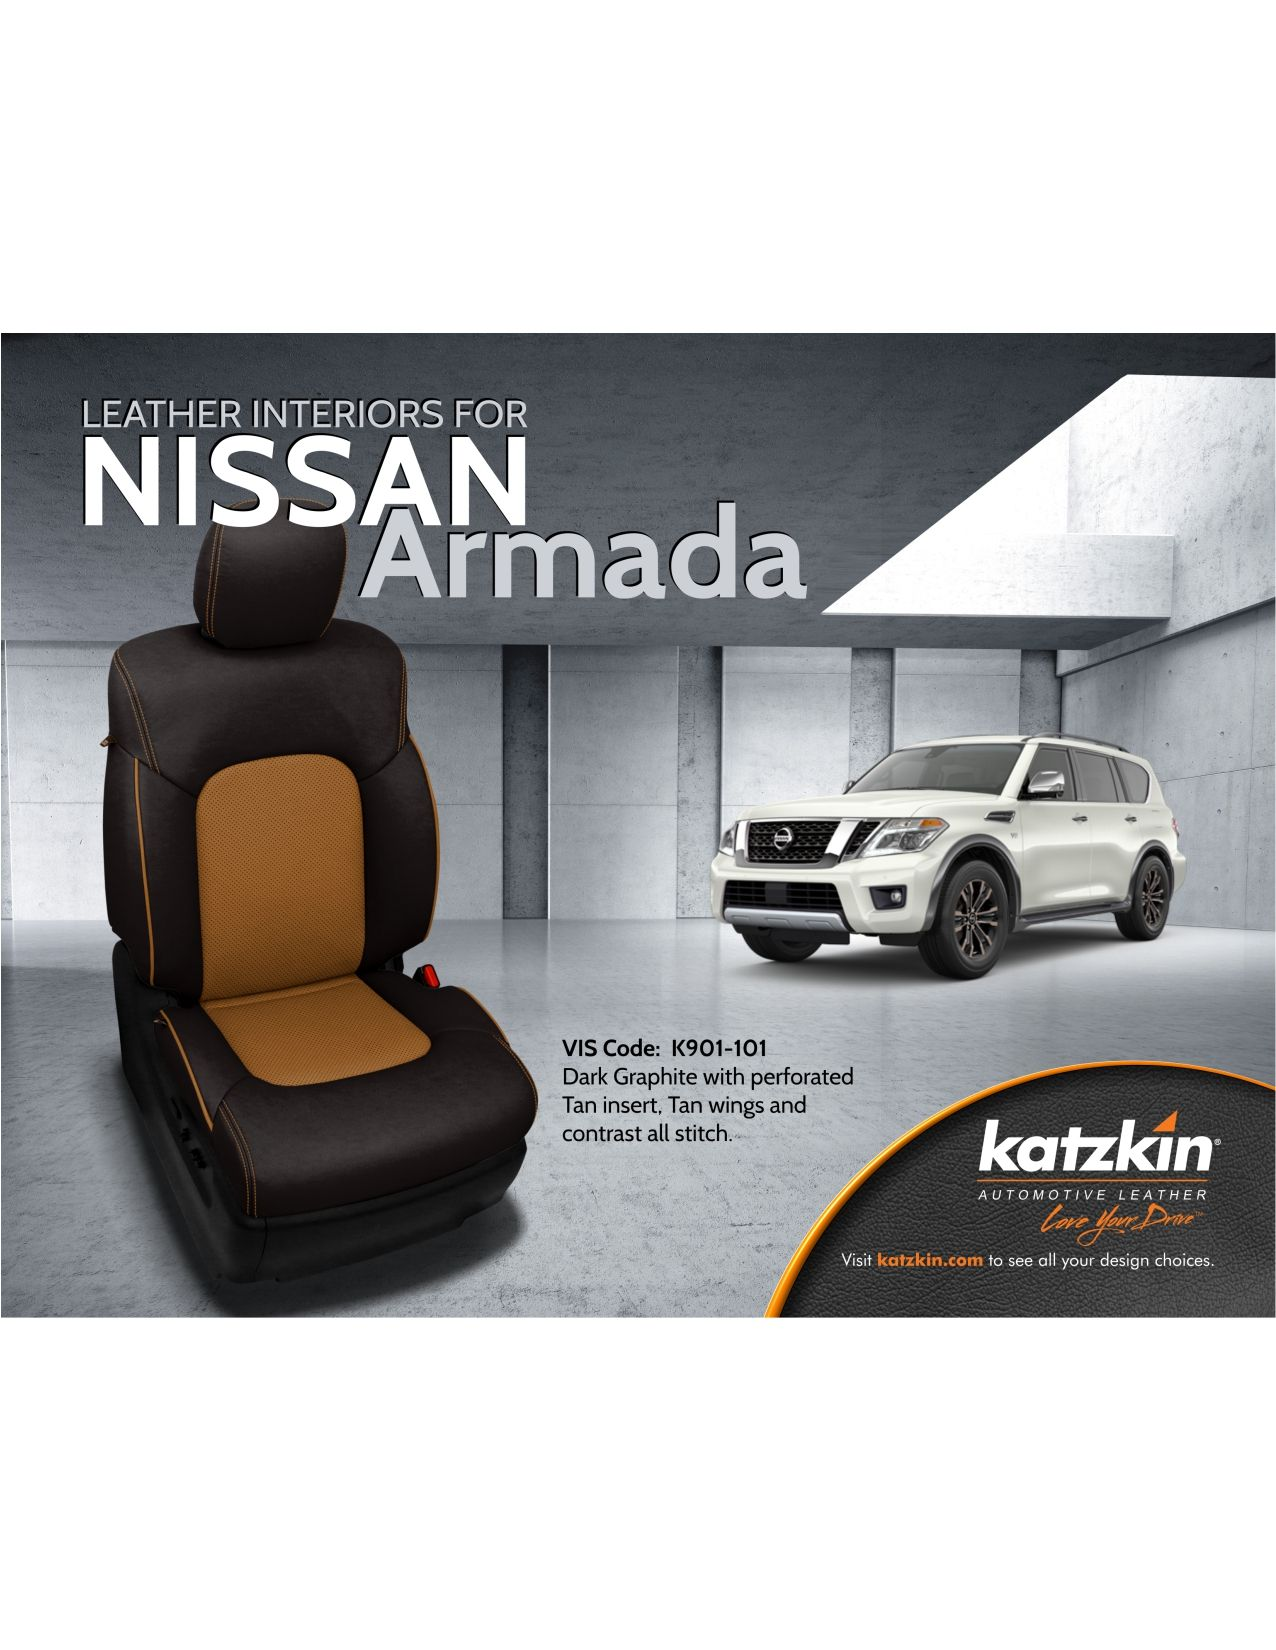 2017 Nissan Armada (E-Brochure)